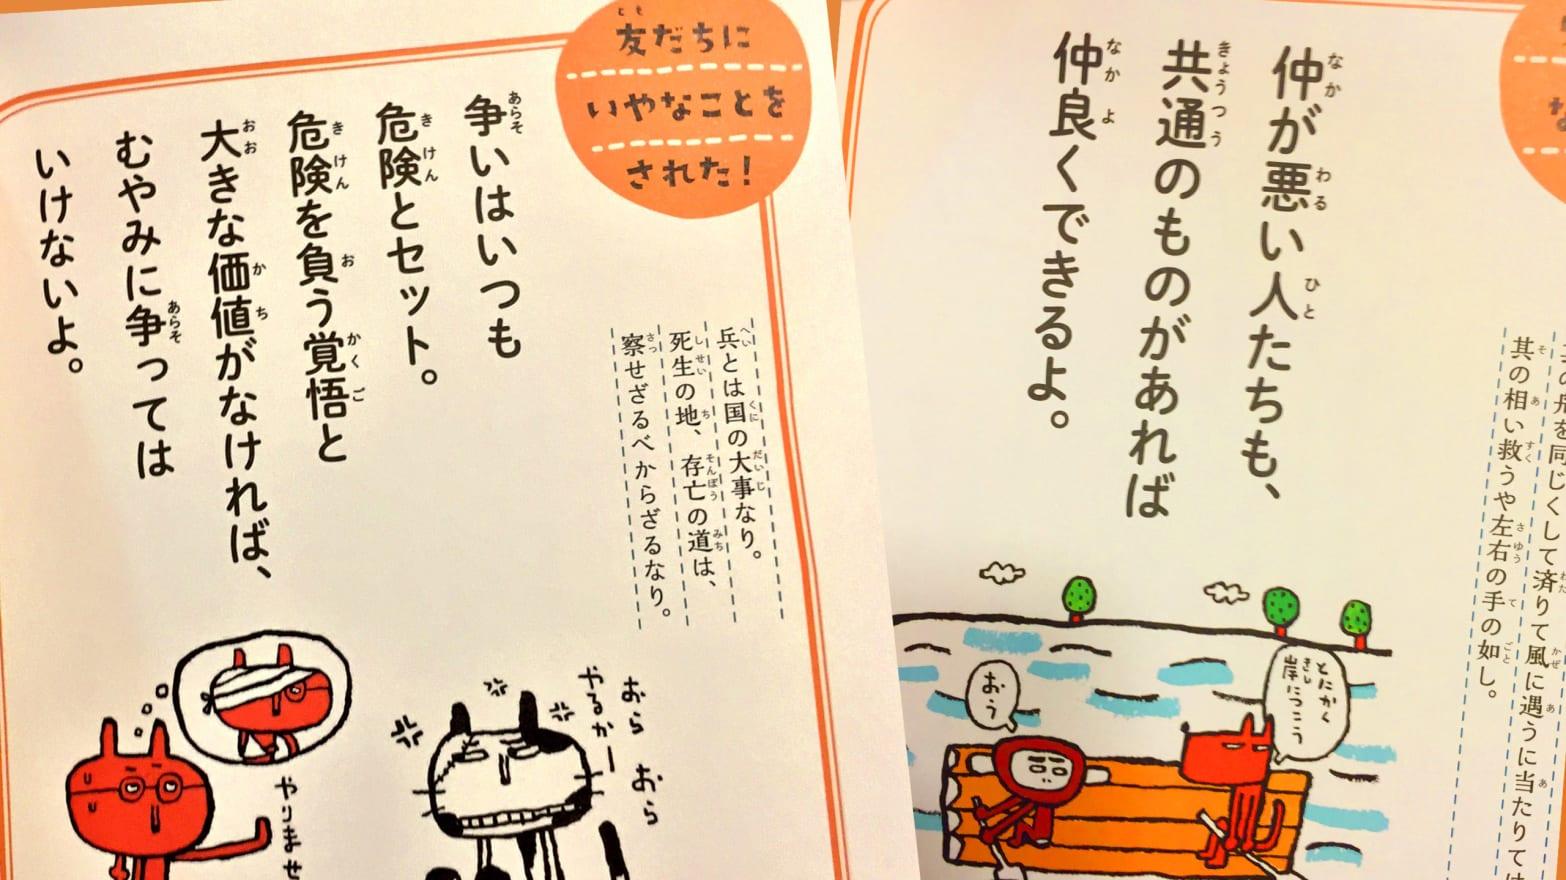 Beyond Education Wars >> Back To School Japan Offers Sun Tzu S Art Of War For First Graders